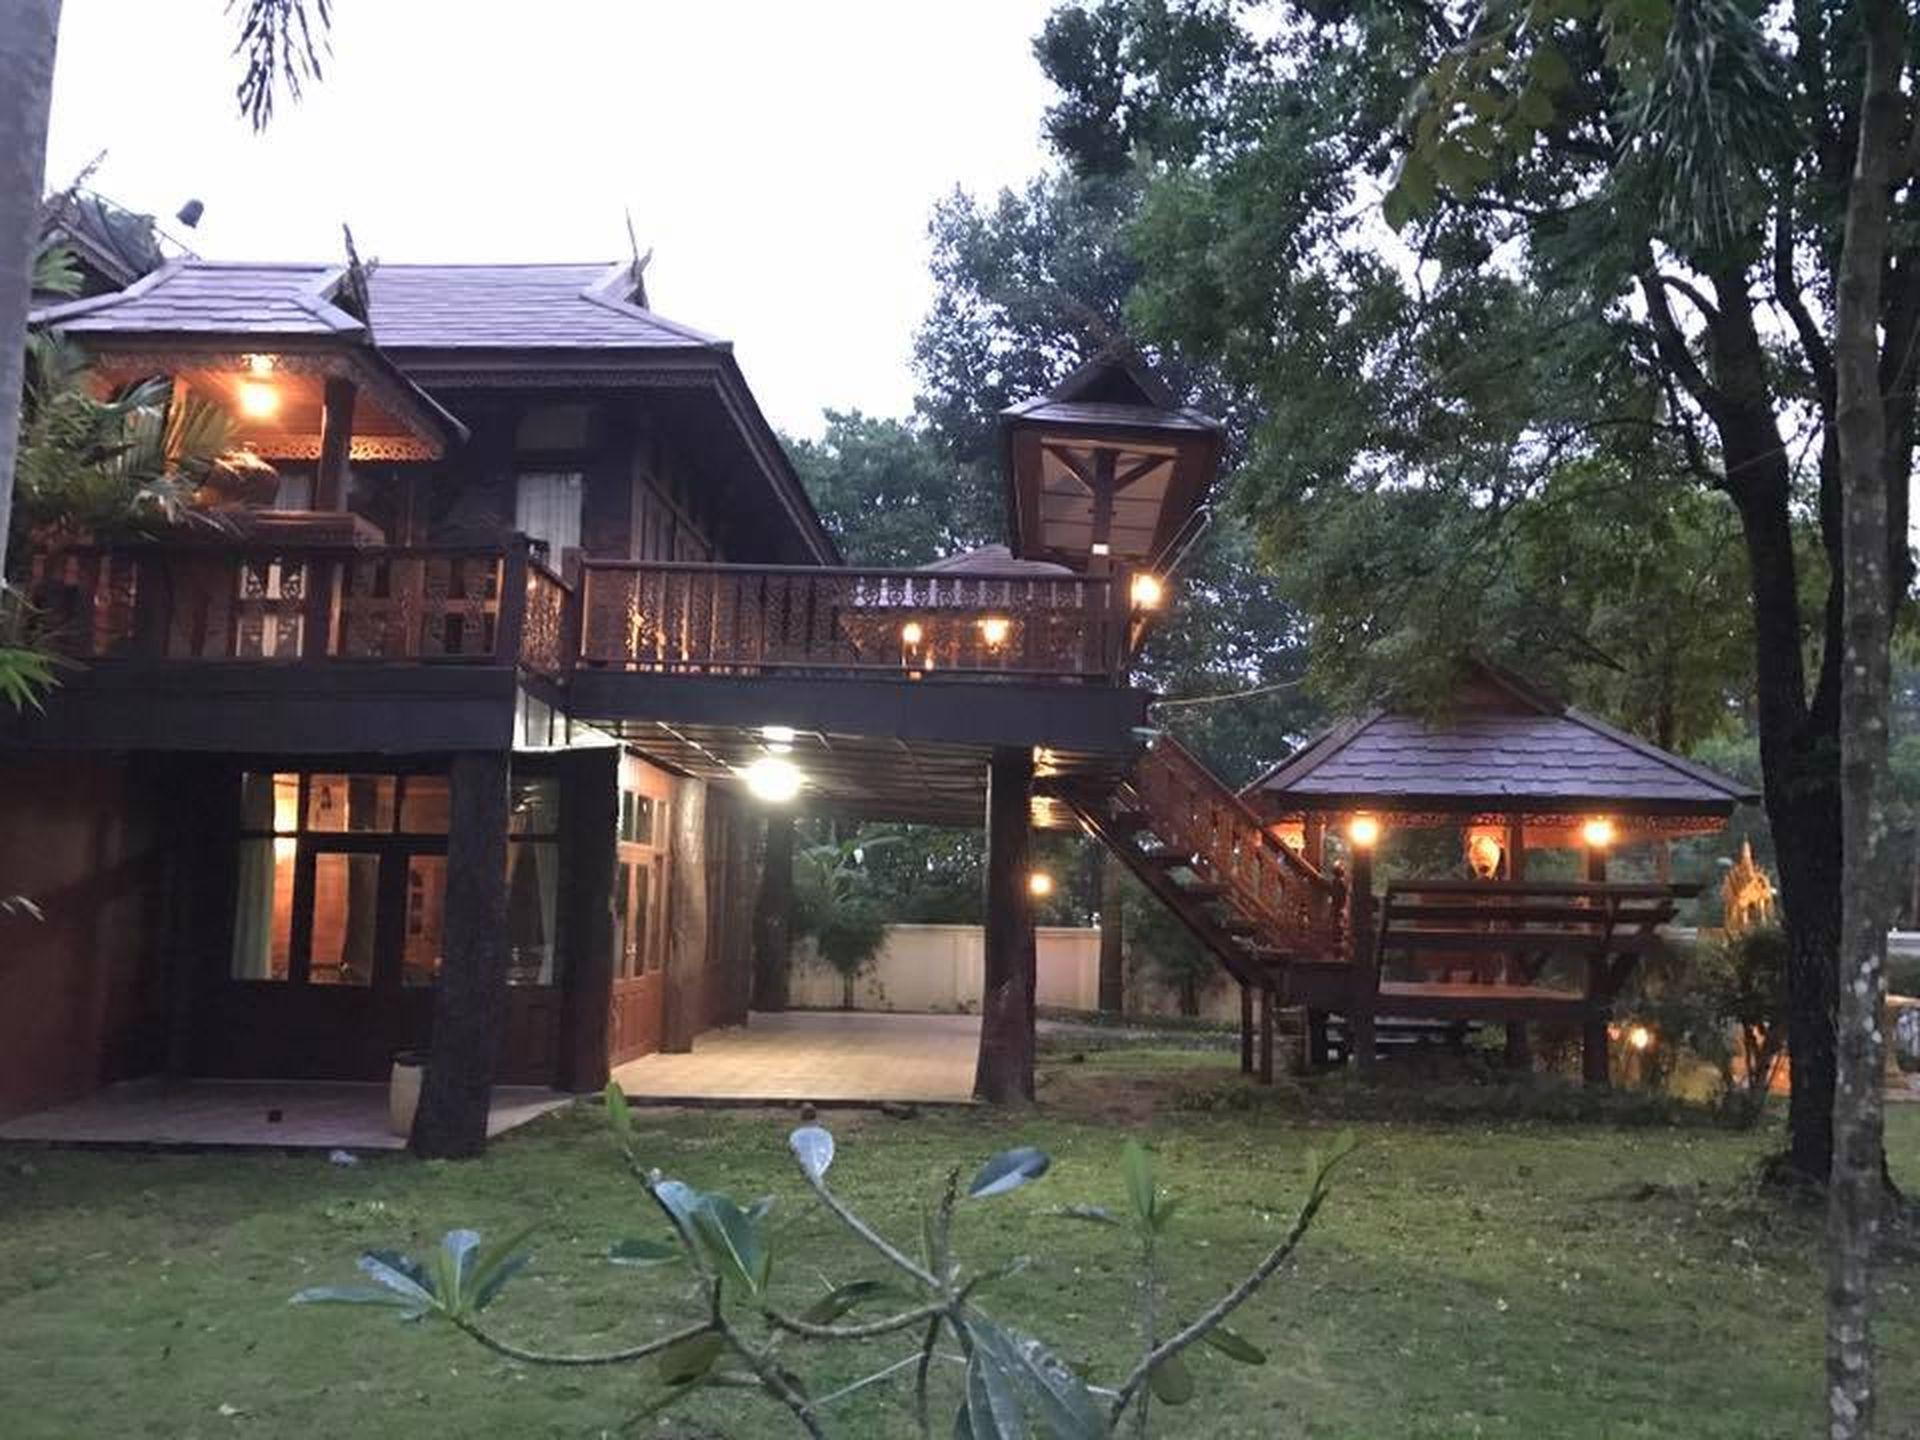 Olive Resort Pattaya โอลีฟ รีสอร์ต พัทยา